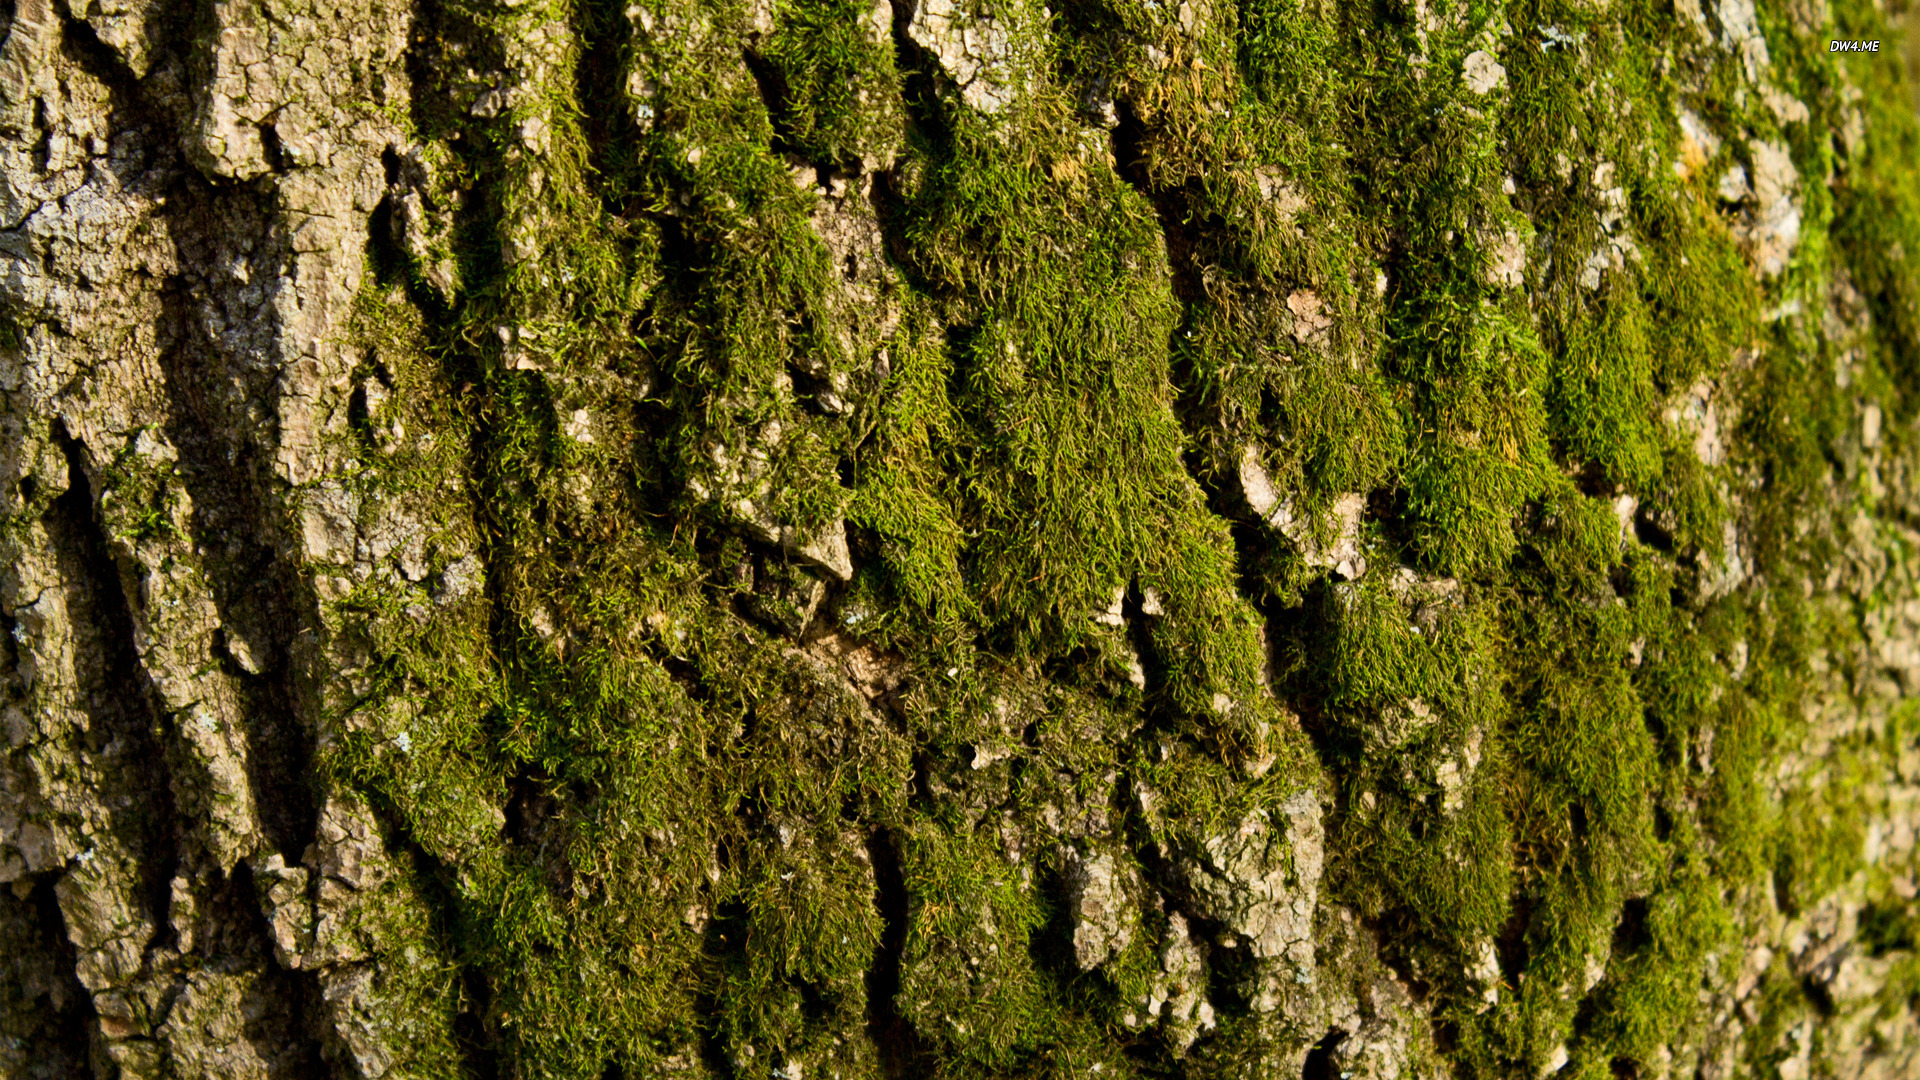 958-mossy-tree-bark-1920x1080-nature-wallpaper